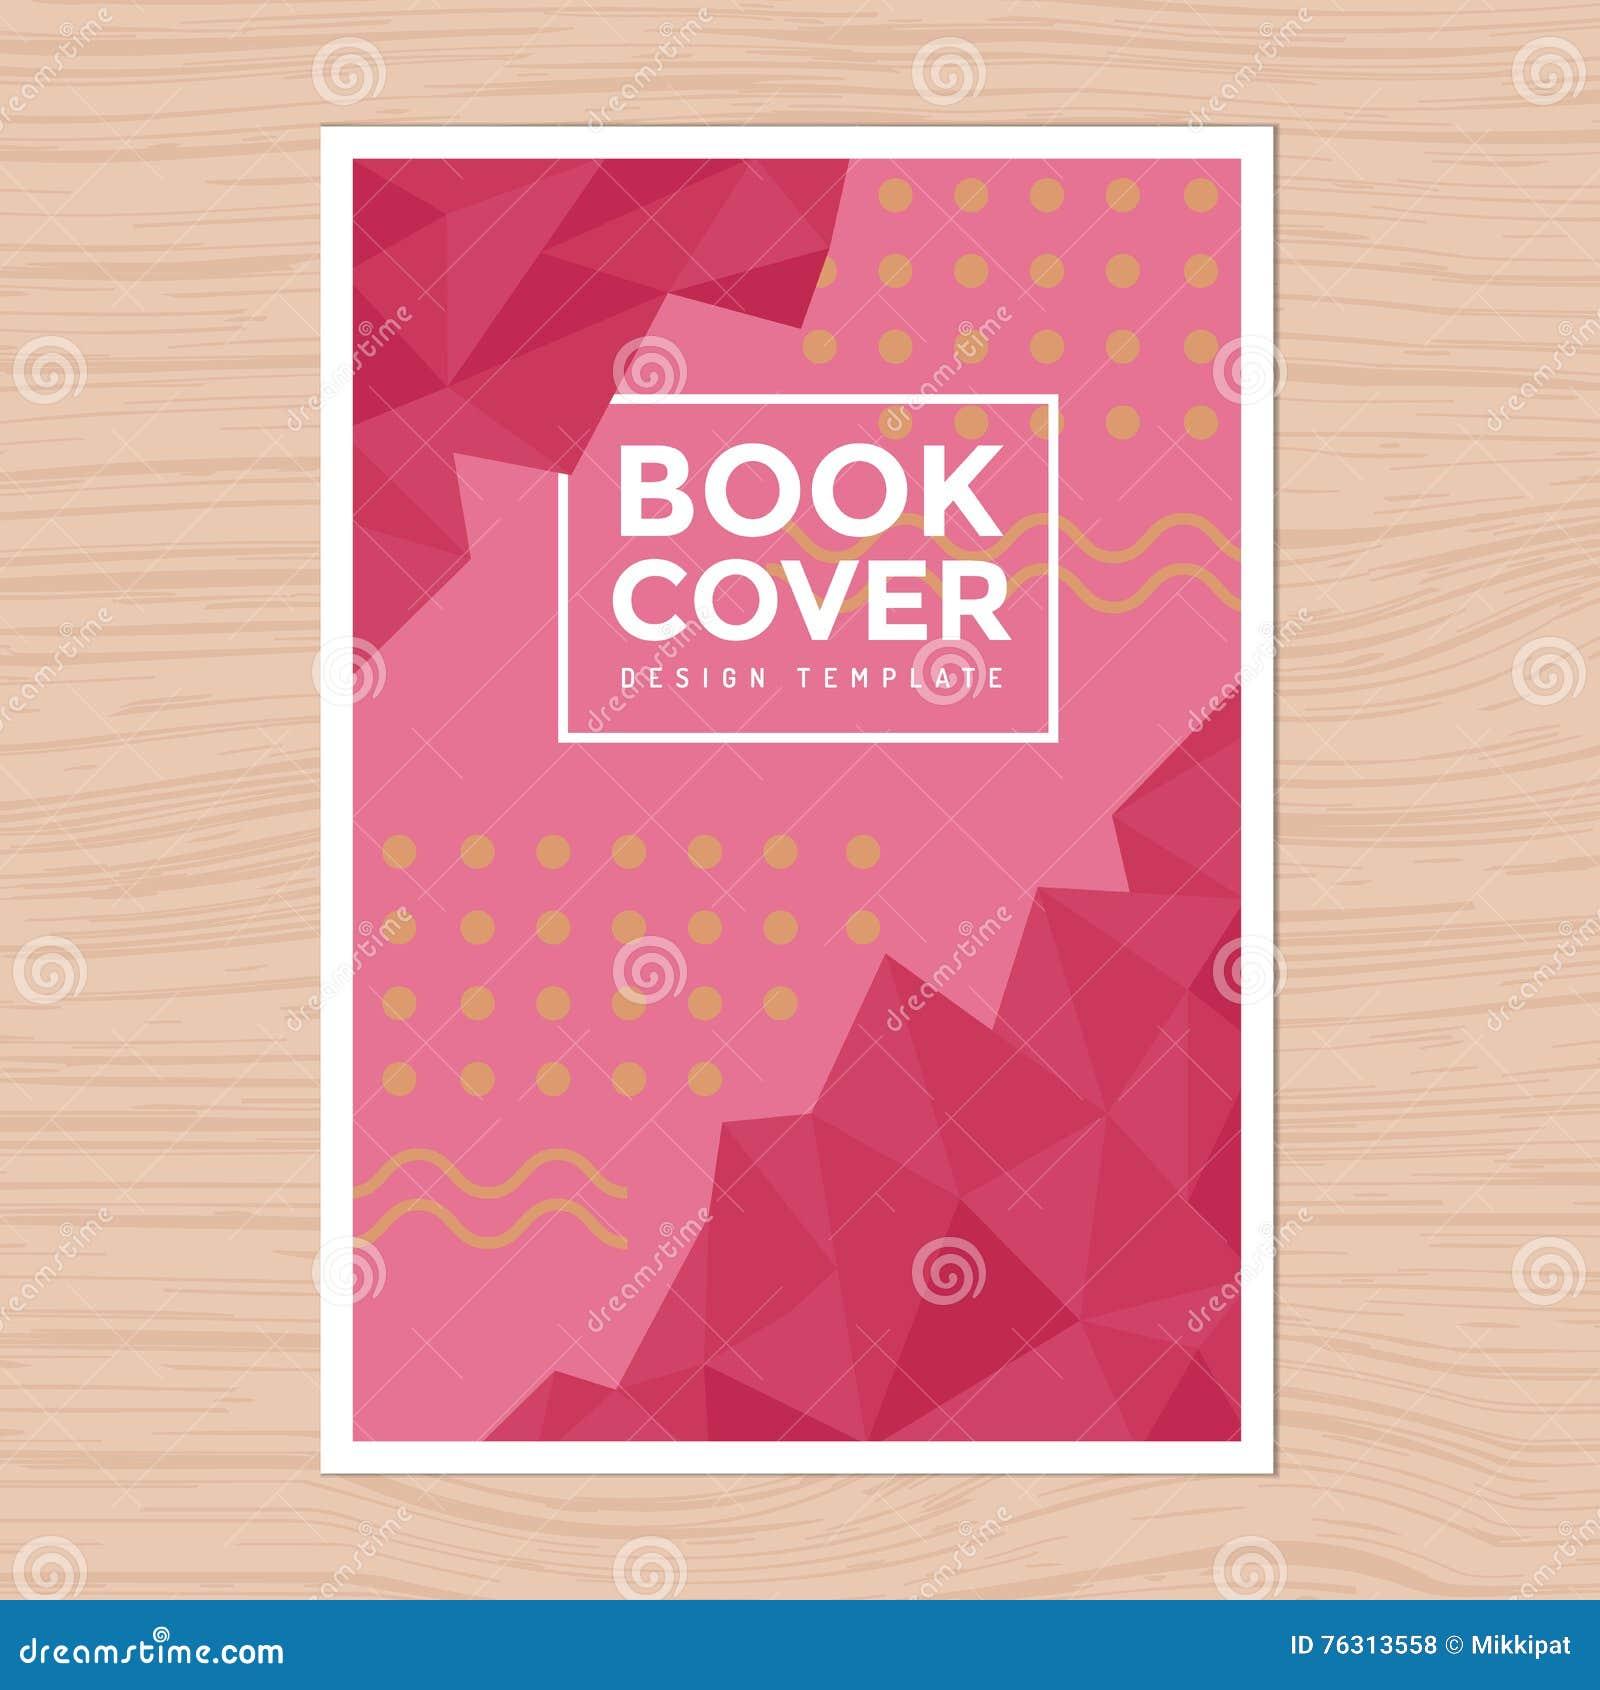 Simple Book Cover Number ~ 现代设计书套, poster, flyer, company公司概况,年终报告在a 大小的设计版面模板 向量例证